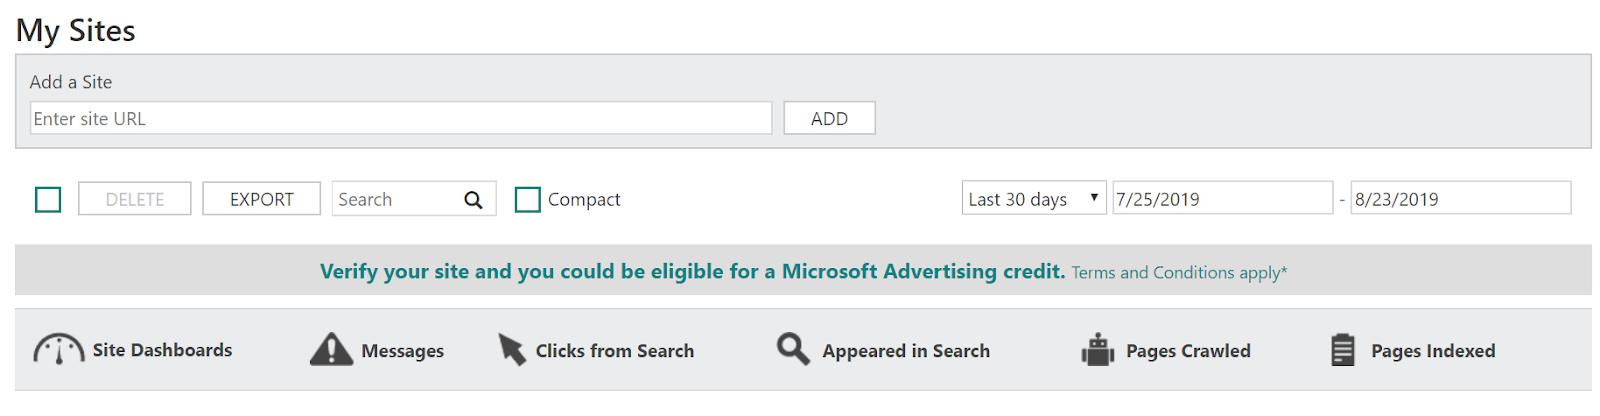 Screenshot of the Bing Webmaster Tools login screen.